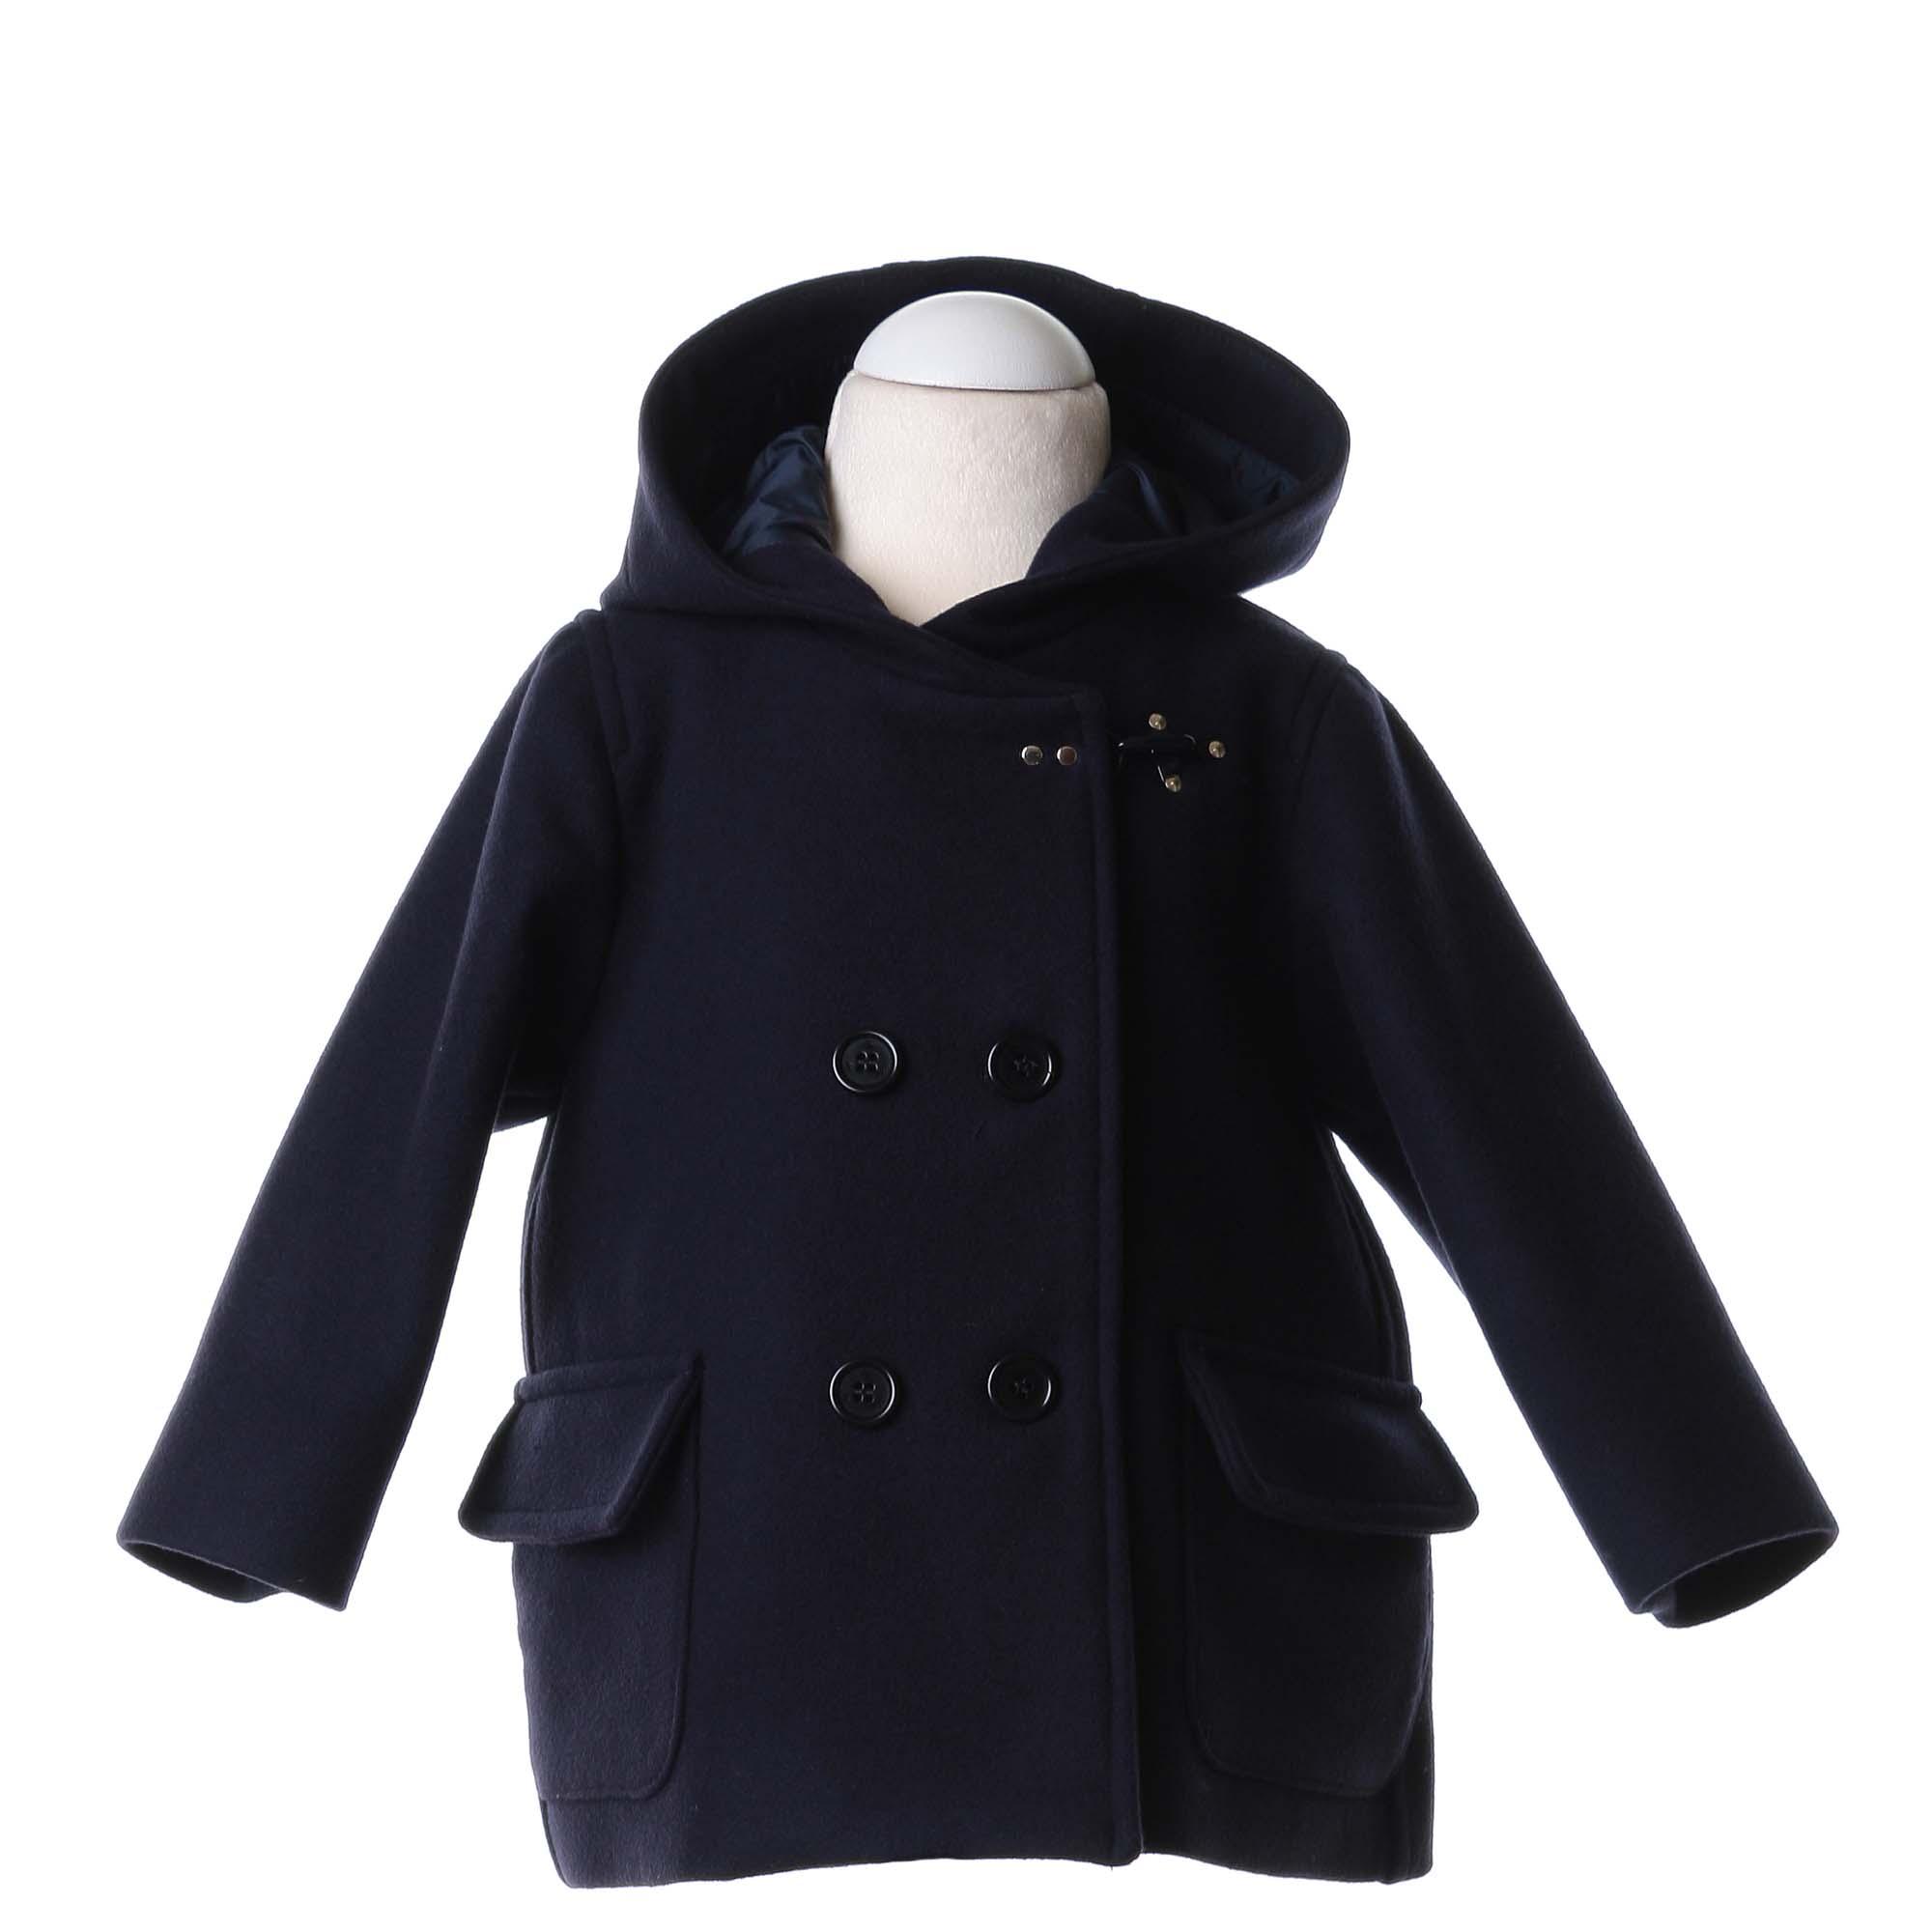 online store c72f0 0abd5 Cappottino Bimba In Panno Di Lana Blu